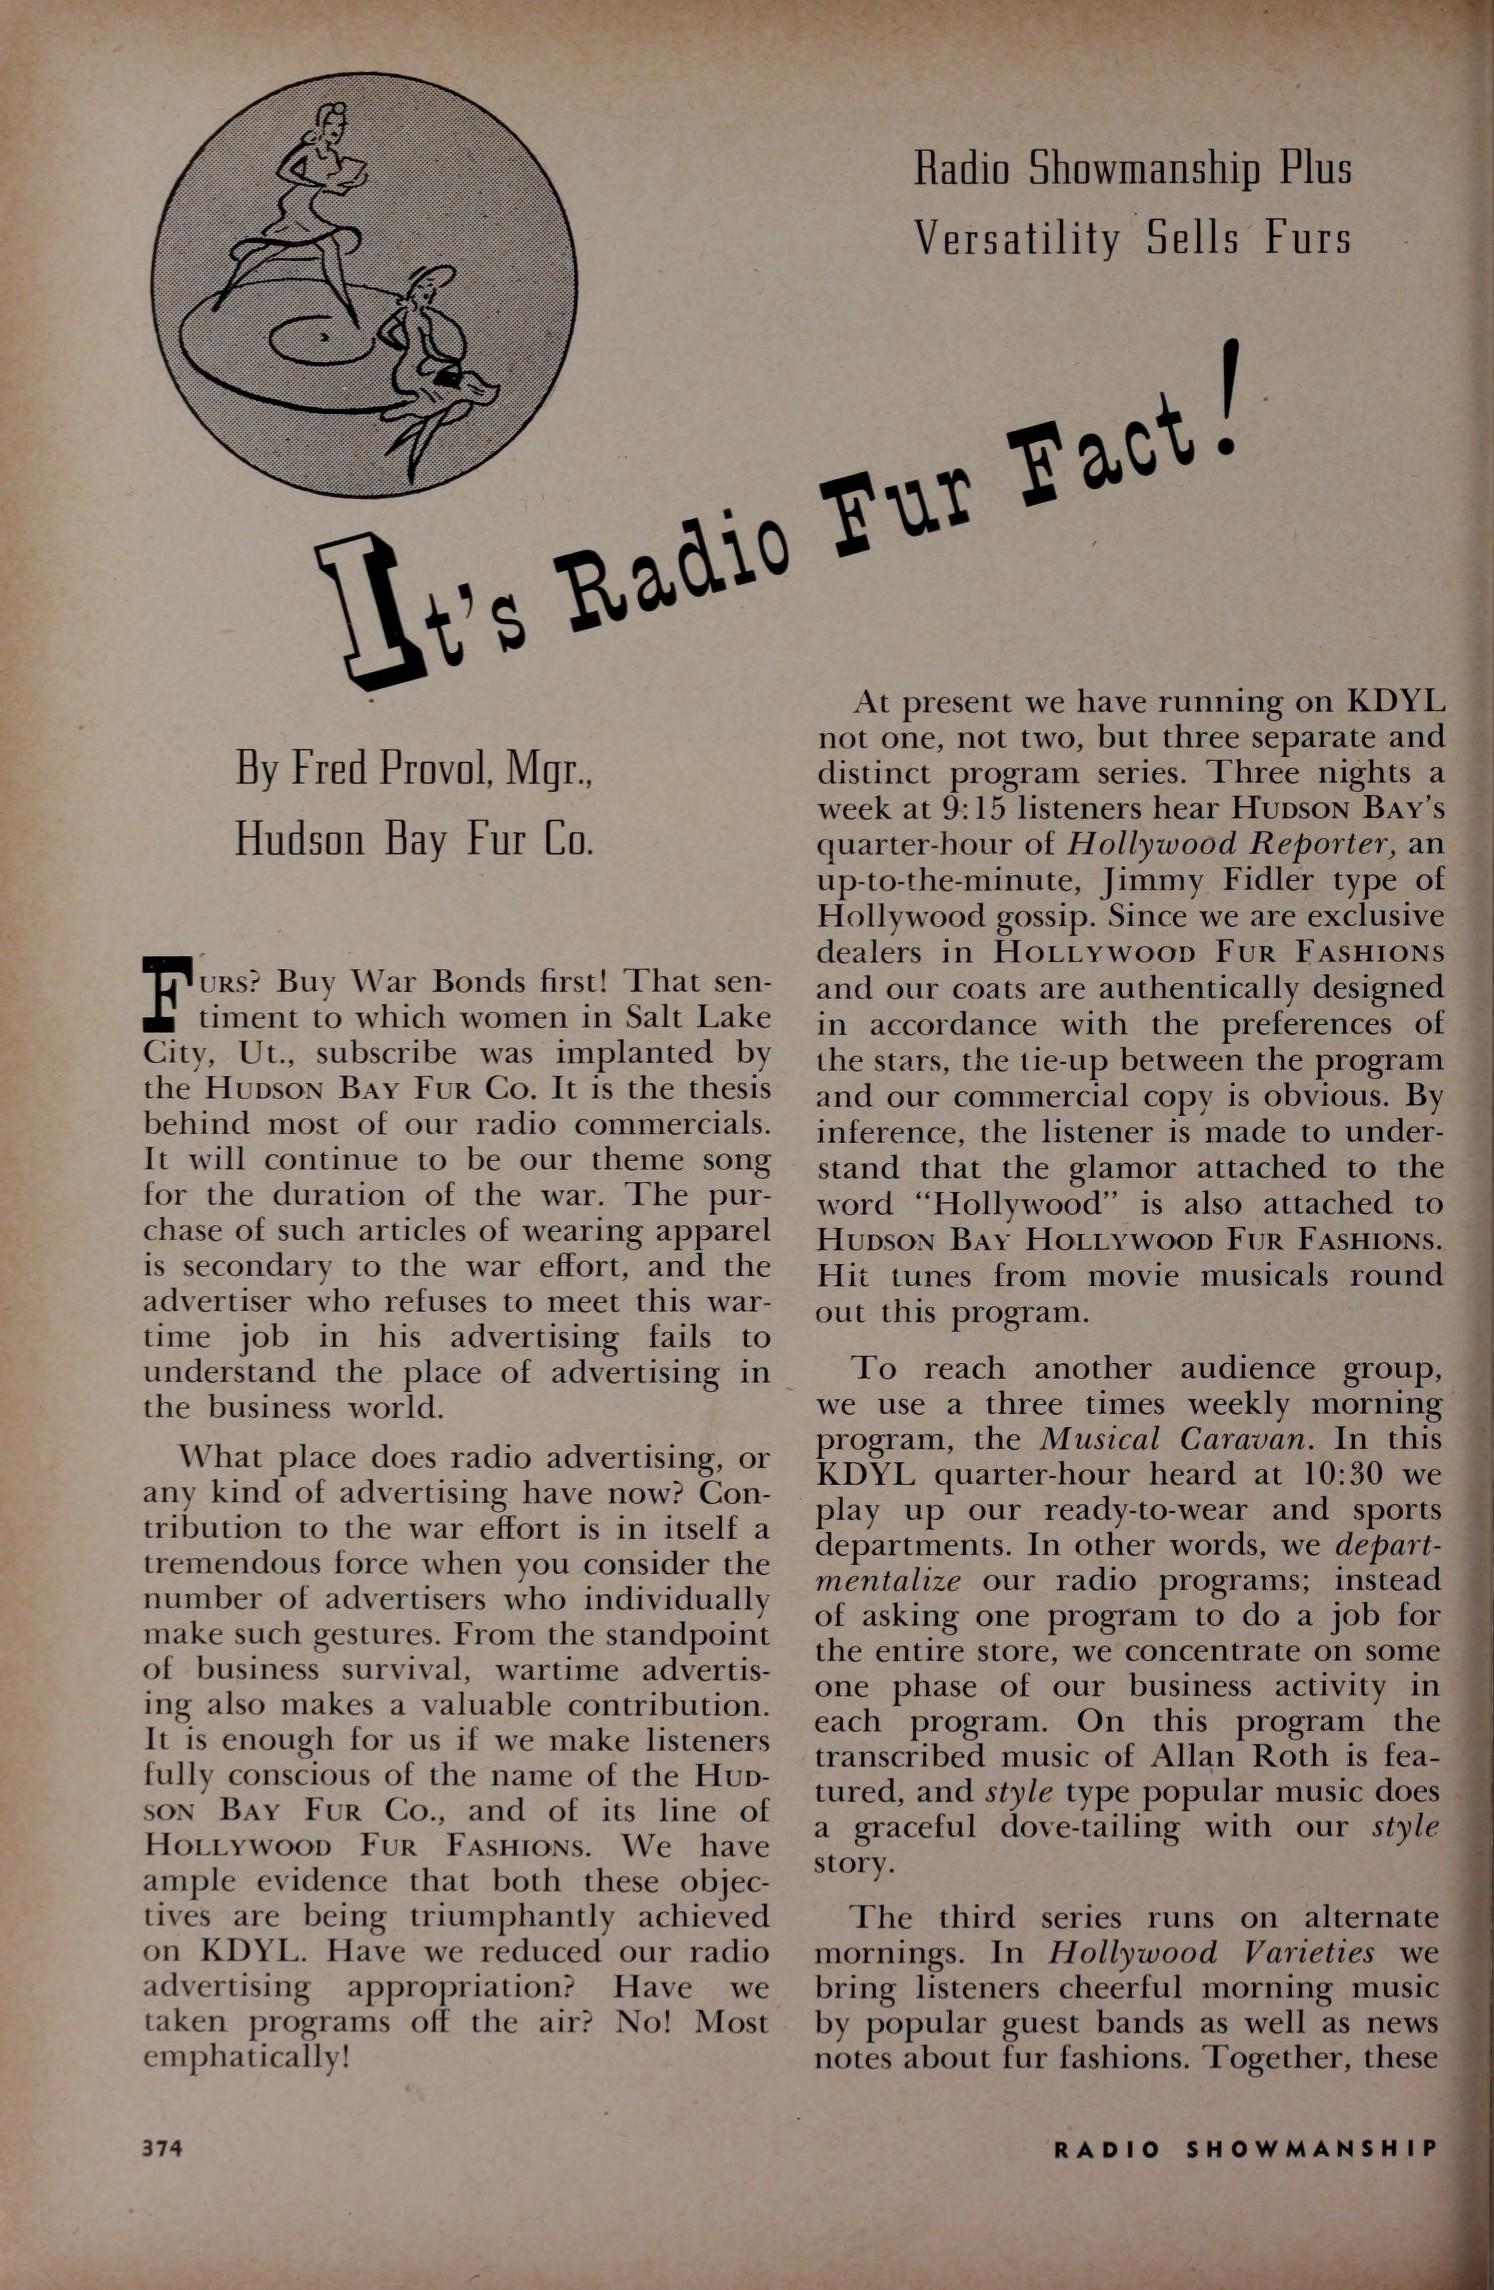 Radioshowmanship04radi_jp2.zip&file=radioshowmanship04radi_jp2%2fradioshowmanship04radi_0382